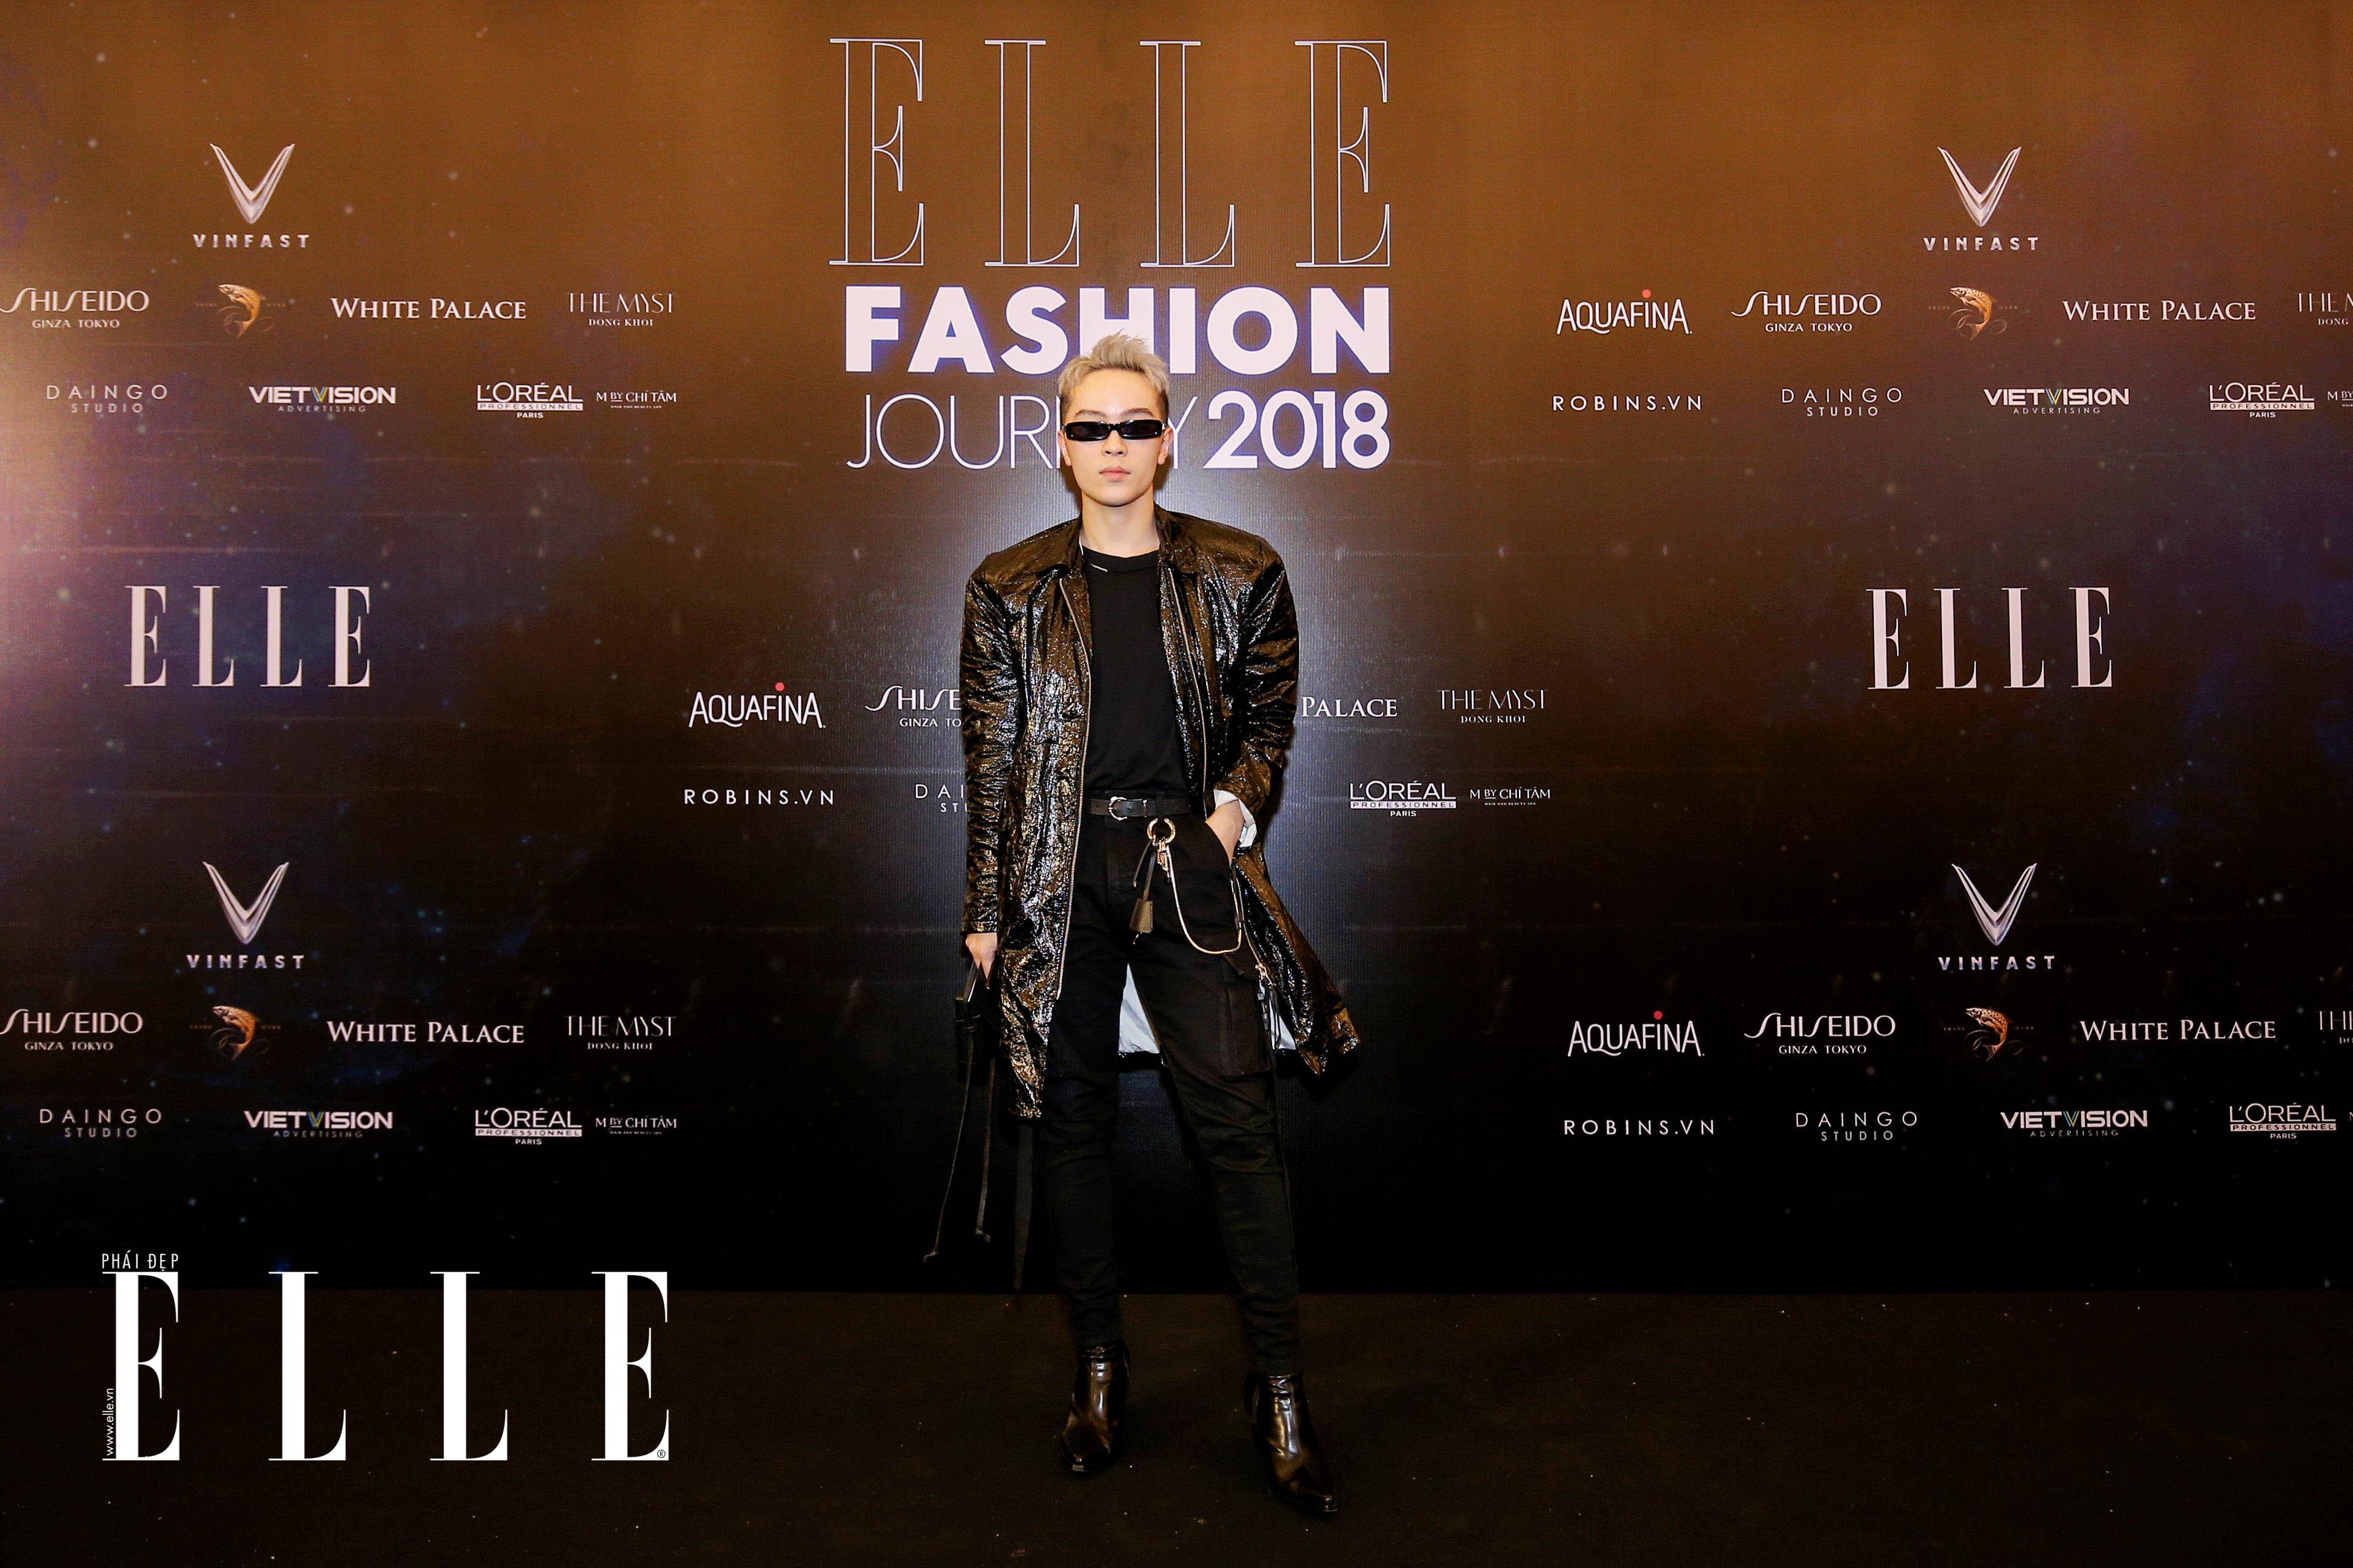 https://www.elleman.vn/wp-content/uploads/2018/12/11/elle-fashion-journey-2018-elle-man-12.jpg